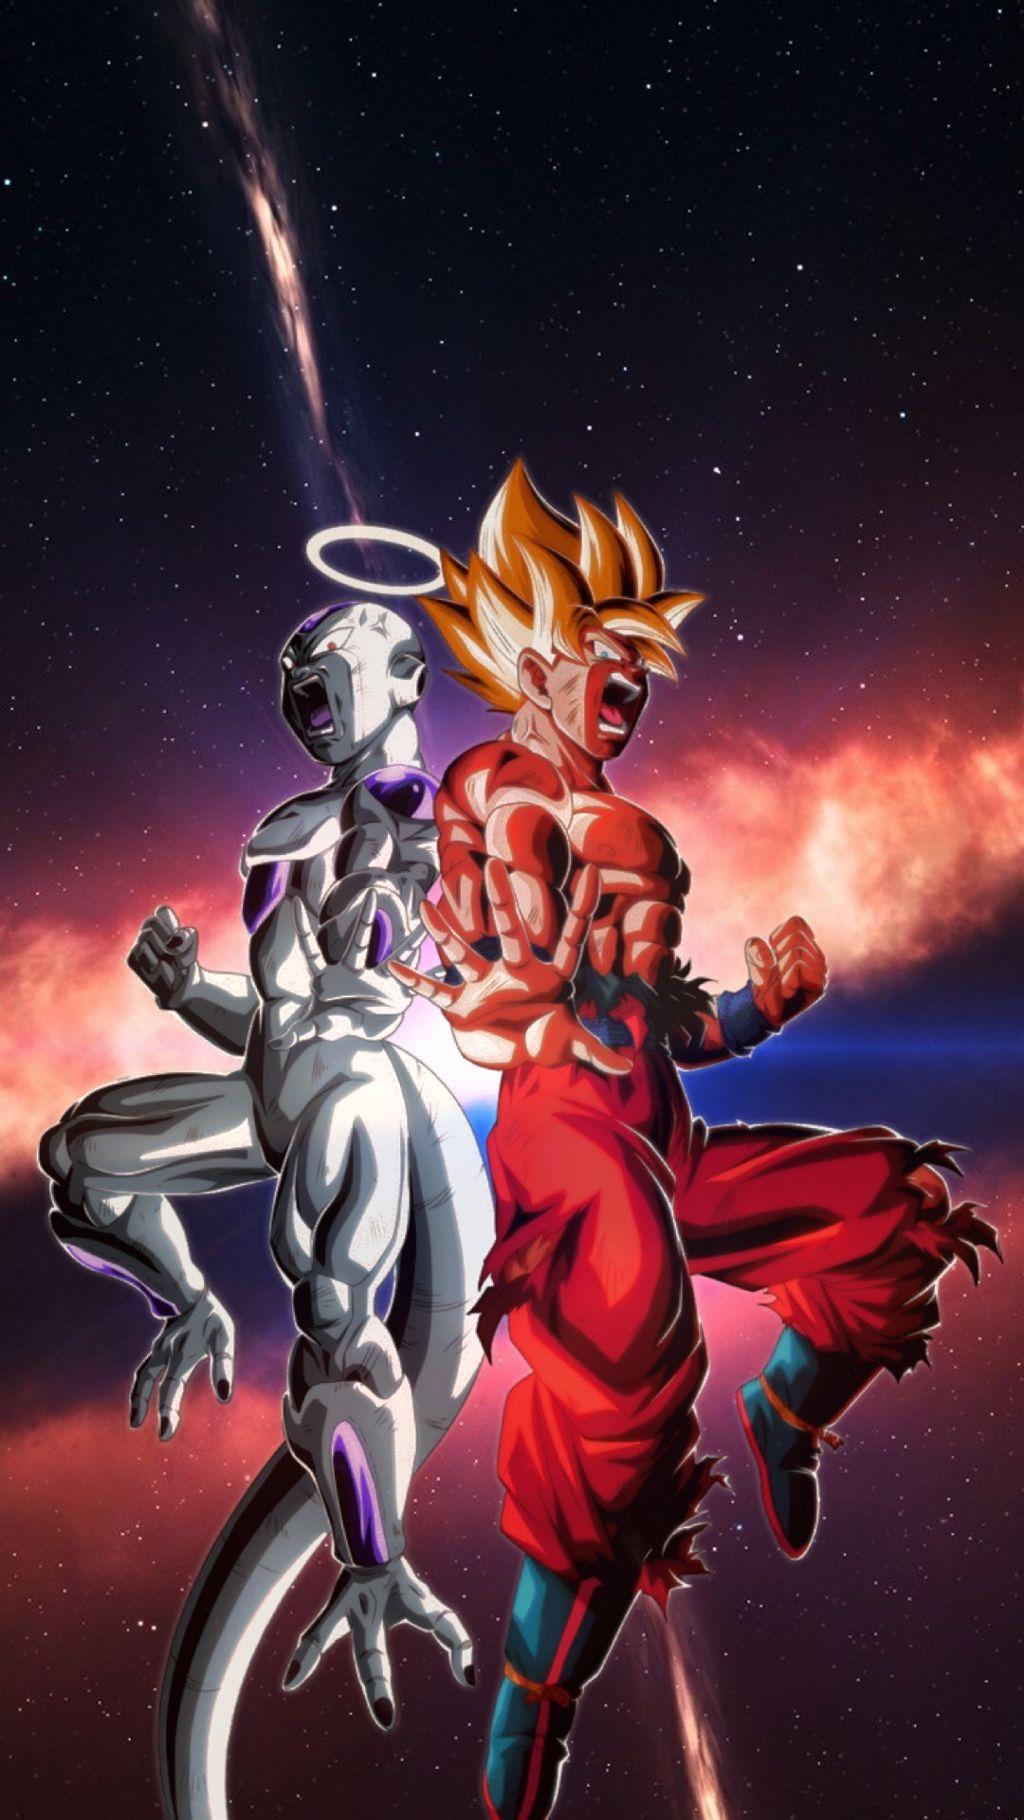 Freetoedit Goku Freezer Wallpaper Iphone Dbs Dragonball